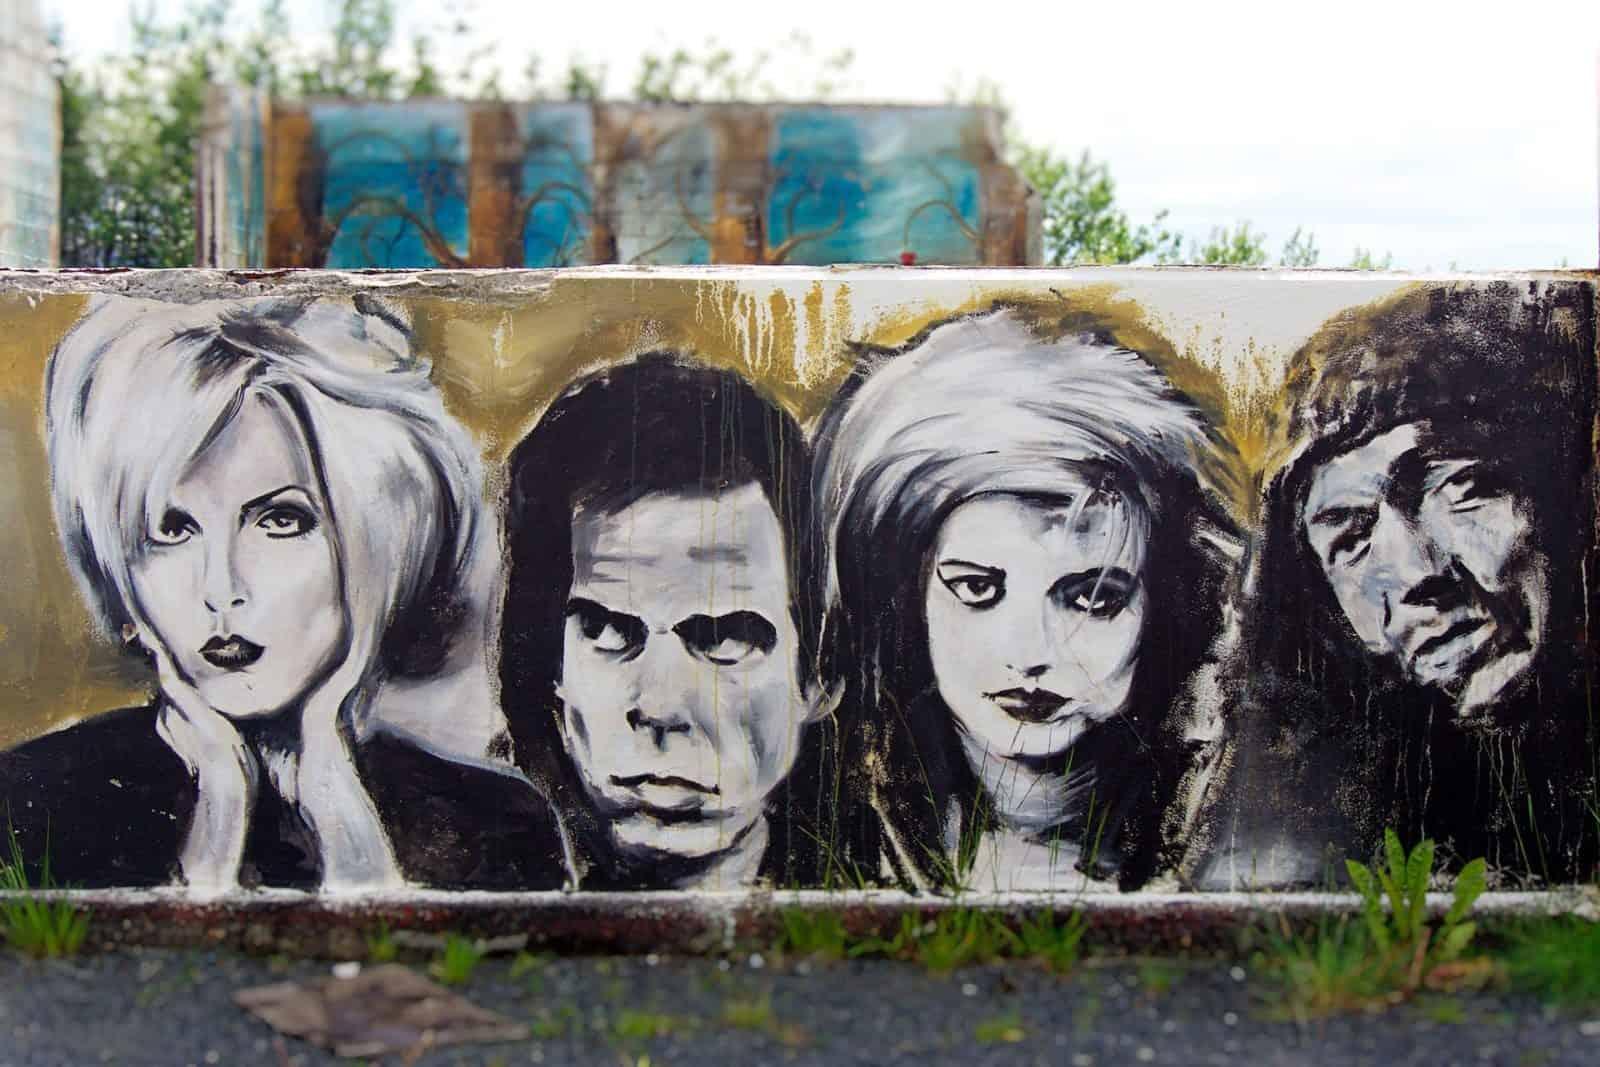 Graffiti in Hveragerði